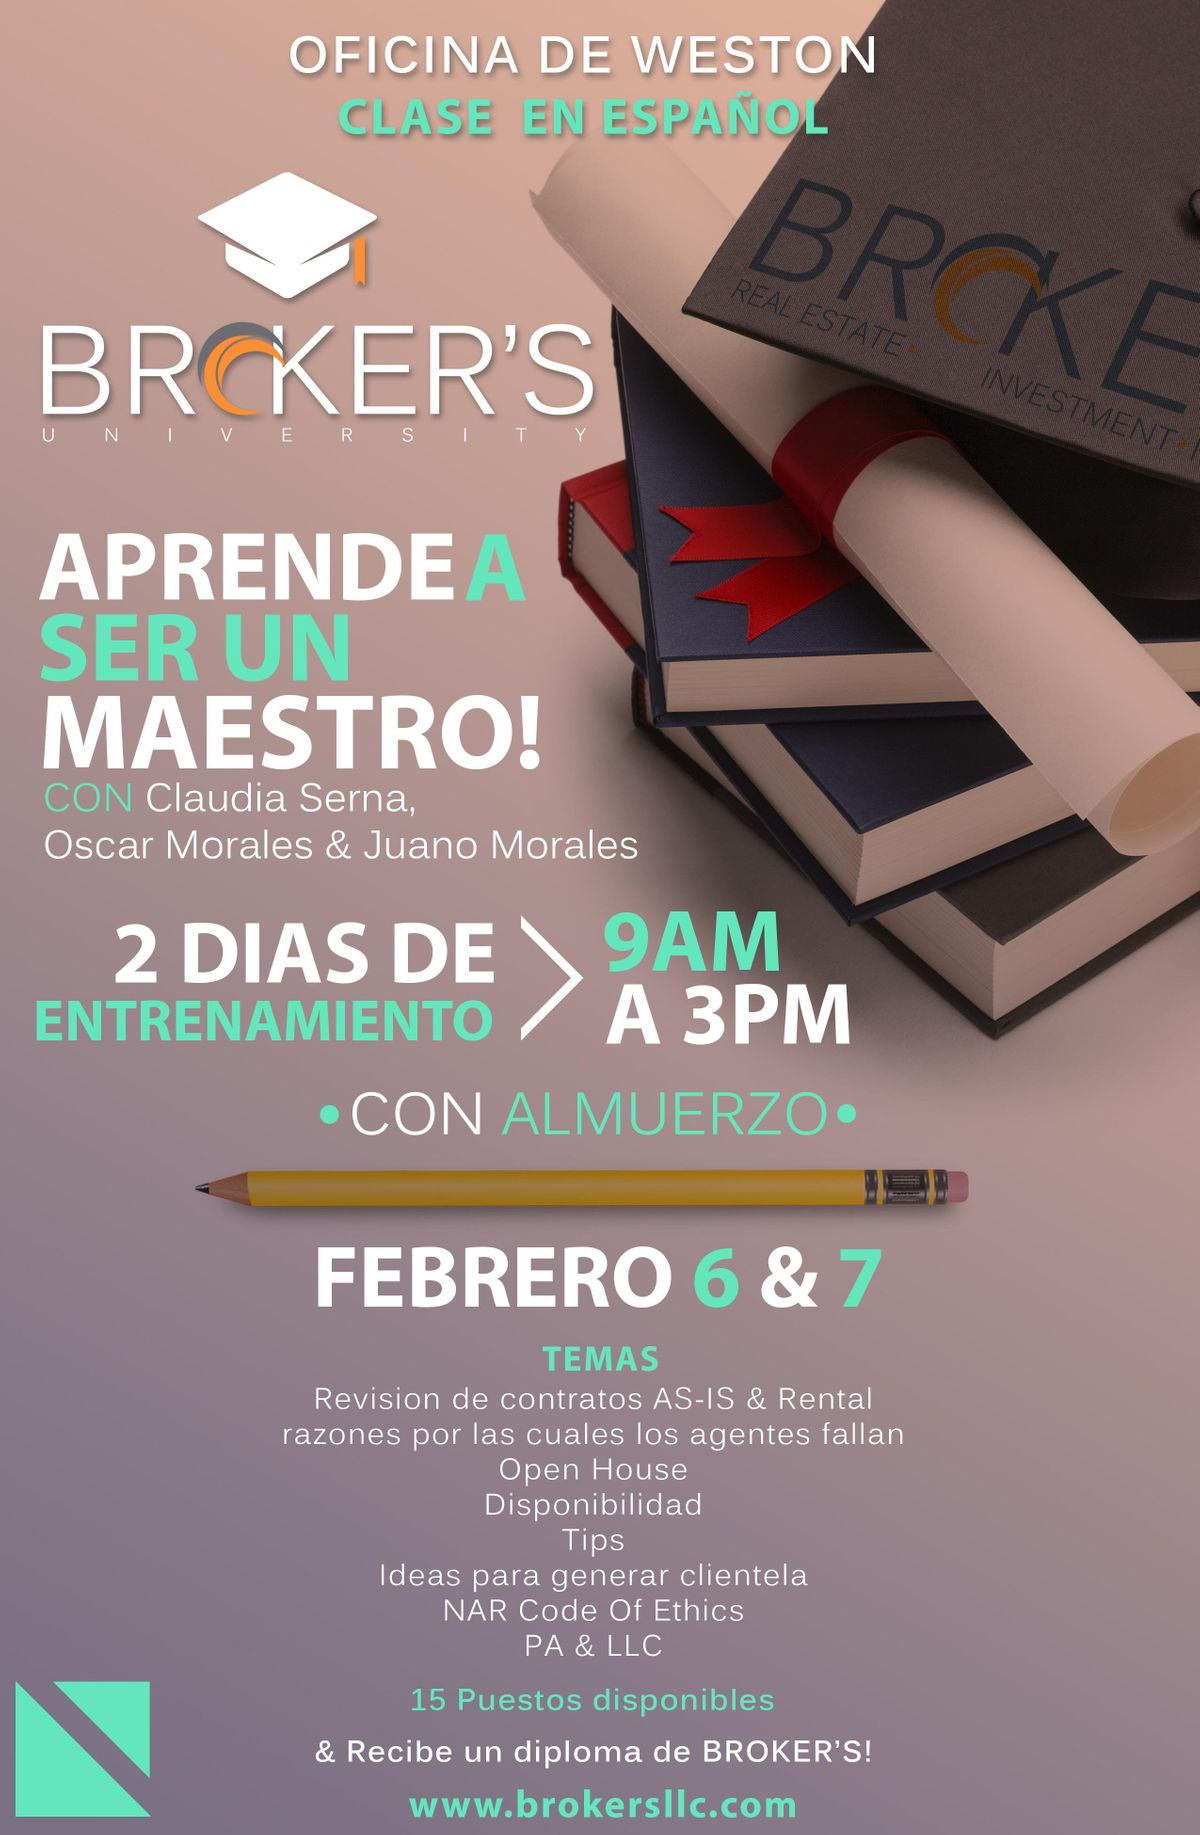 BROKERS university Feb 6 & 7